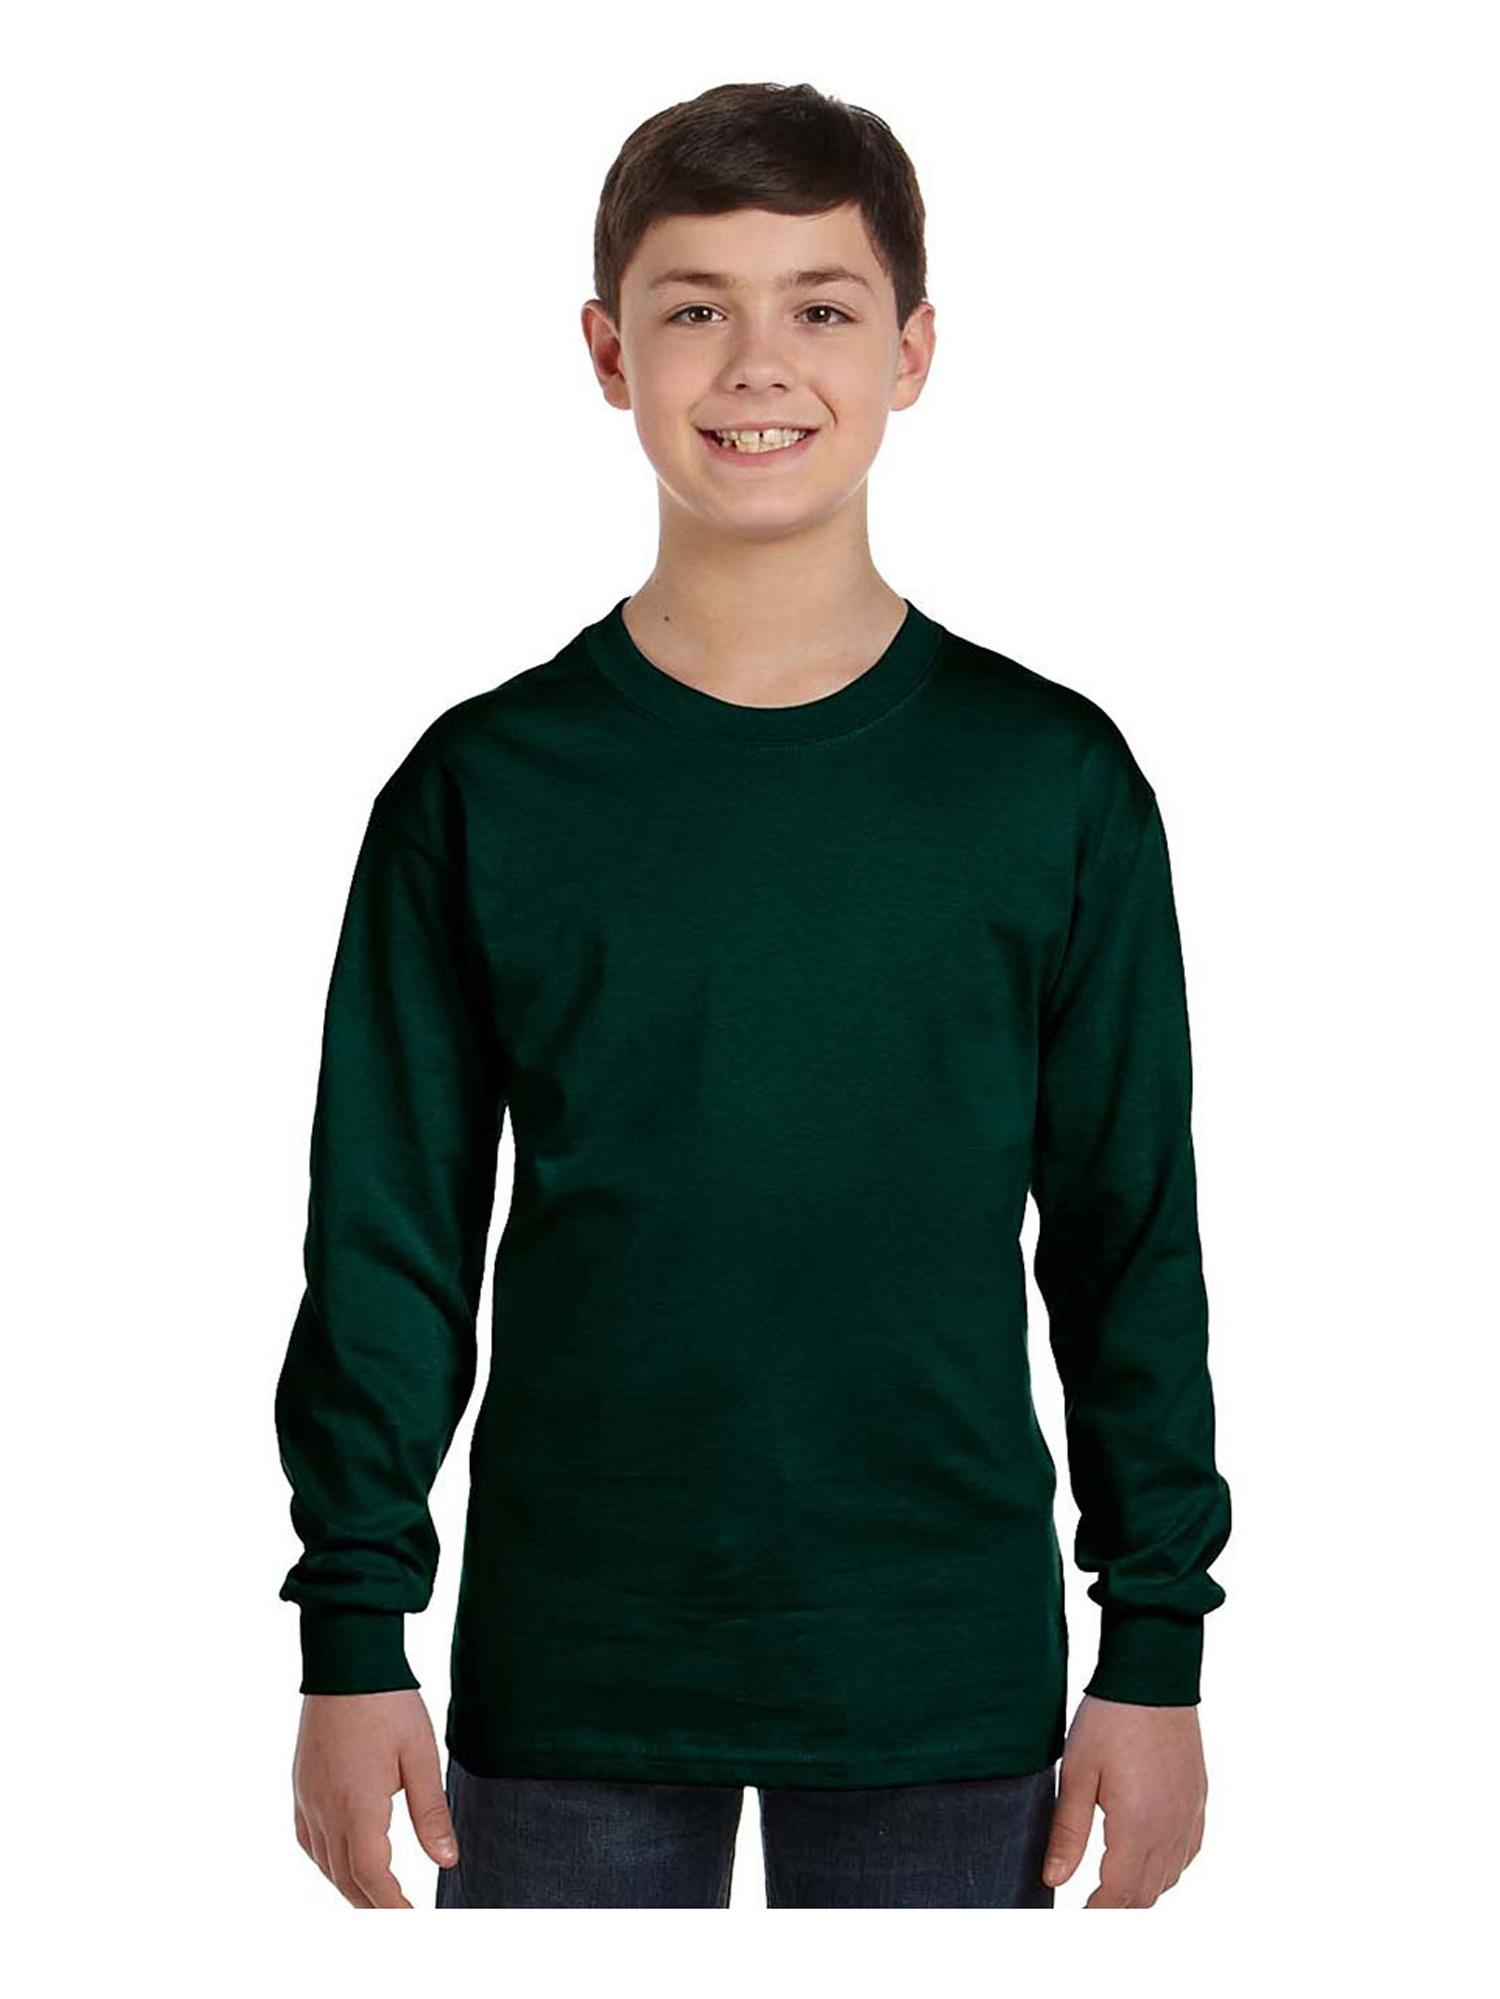 Gildan Big Boys Seamless Crewneck Long Sleeve T-Shirt, Style G5400B